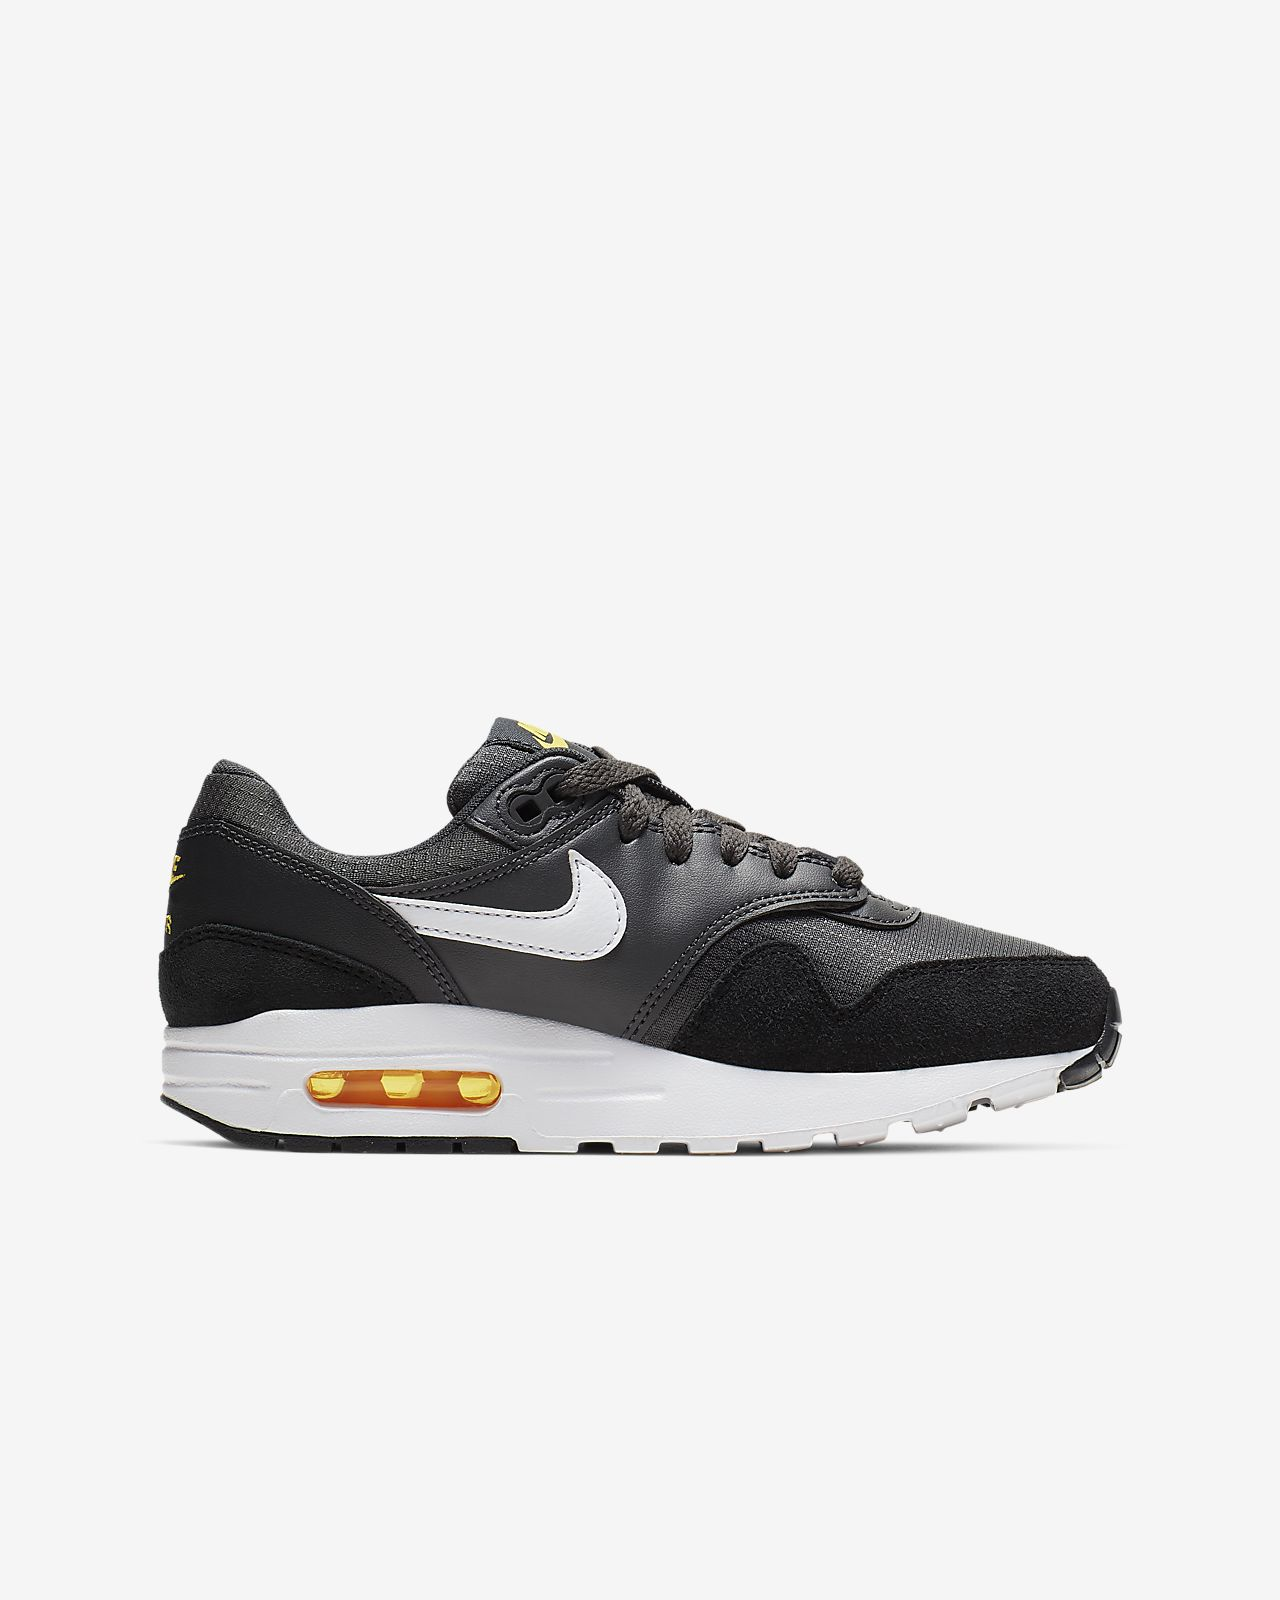 detailed pictures 4317c eb350 ... Nike Air Max 1 – sko til store børn